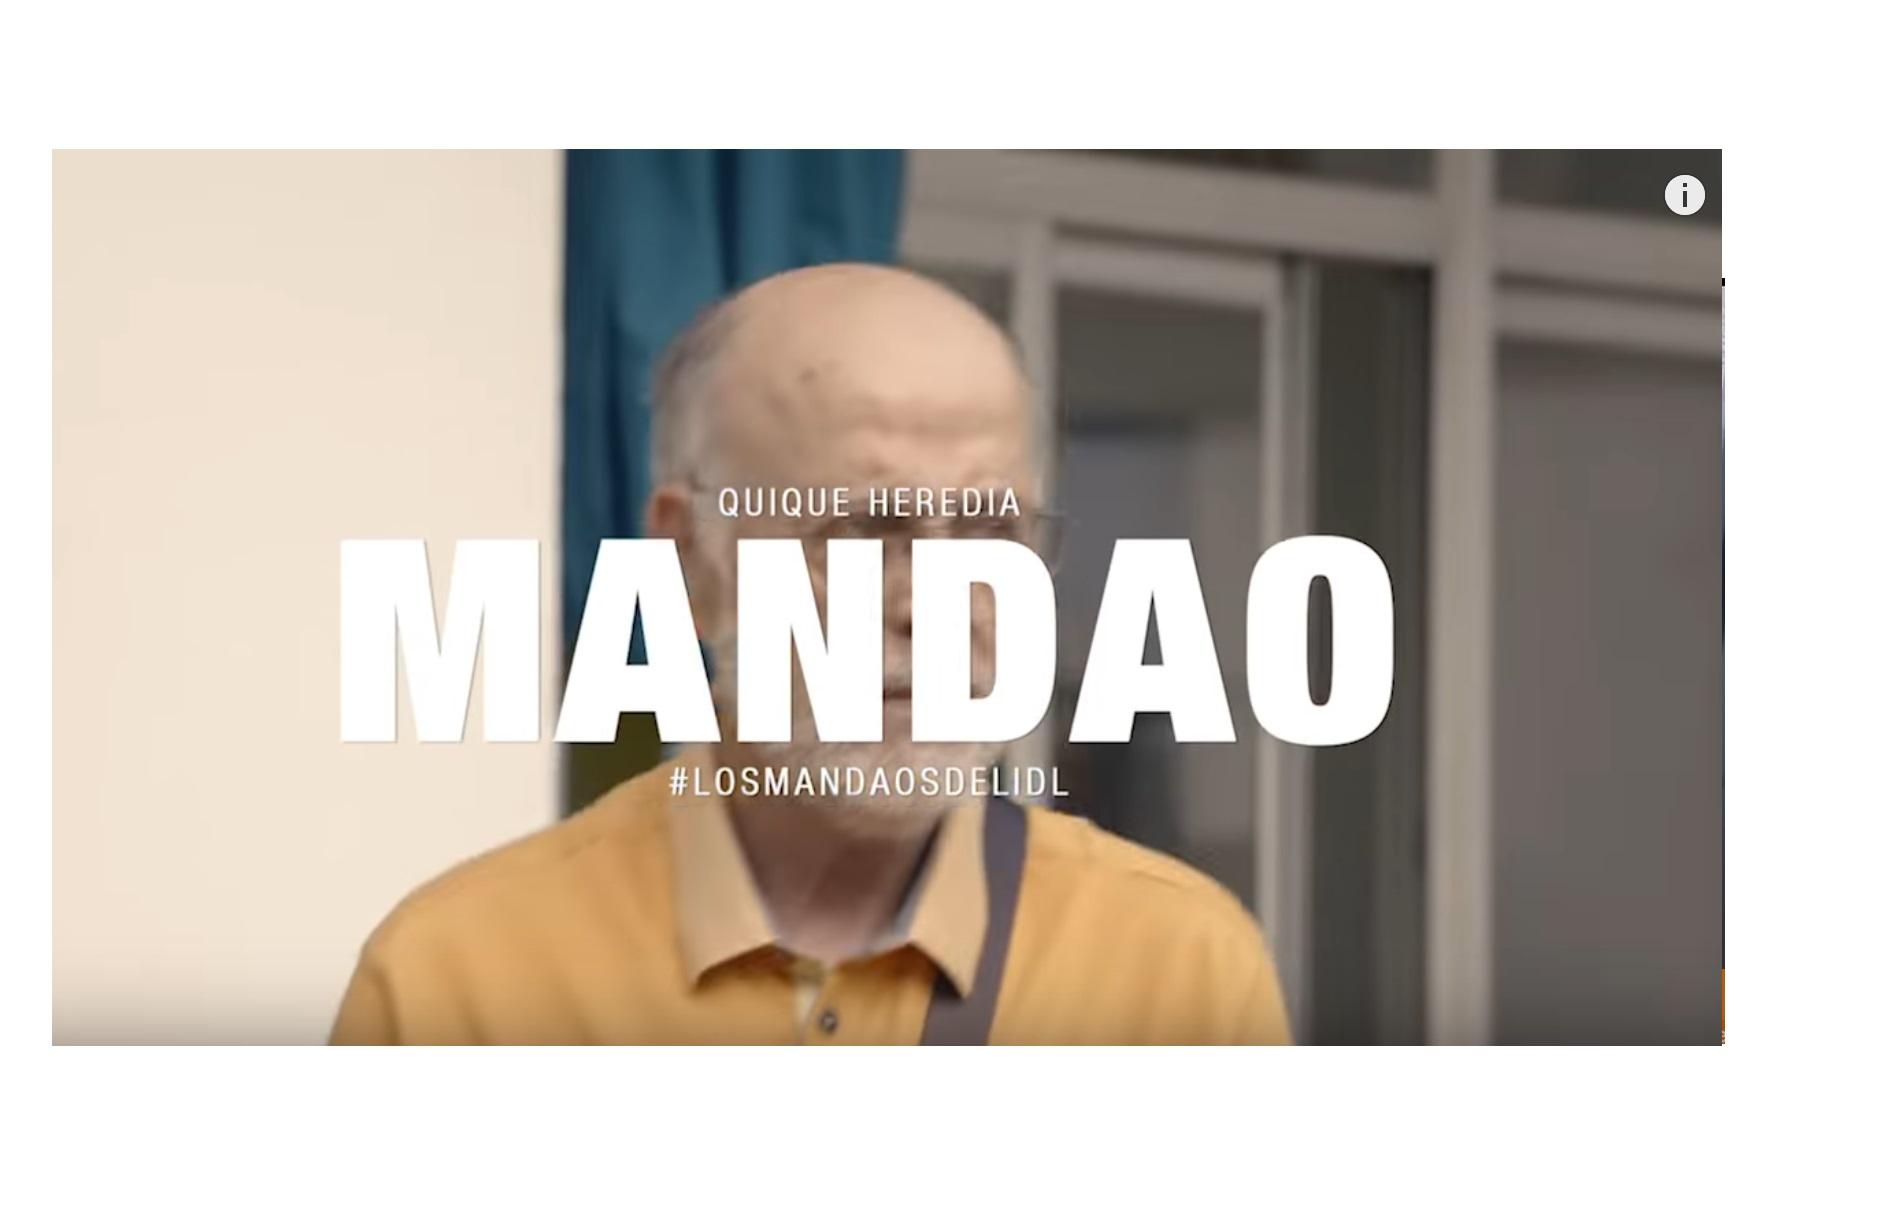 #LosMandaosdeLidl, #LosMandaos, #LidlOnline, mandao, lidl, programapublicidad,